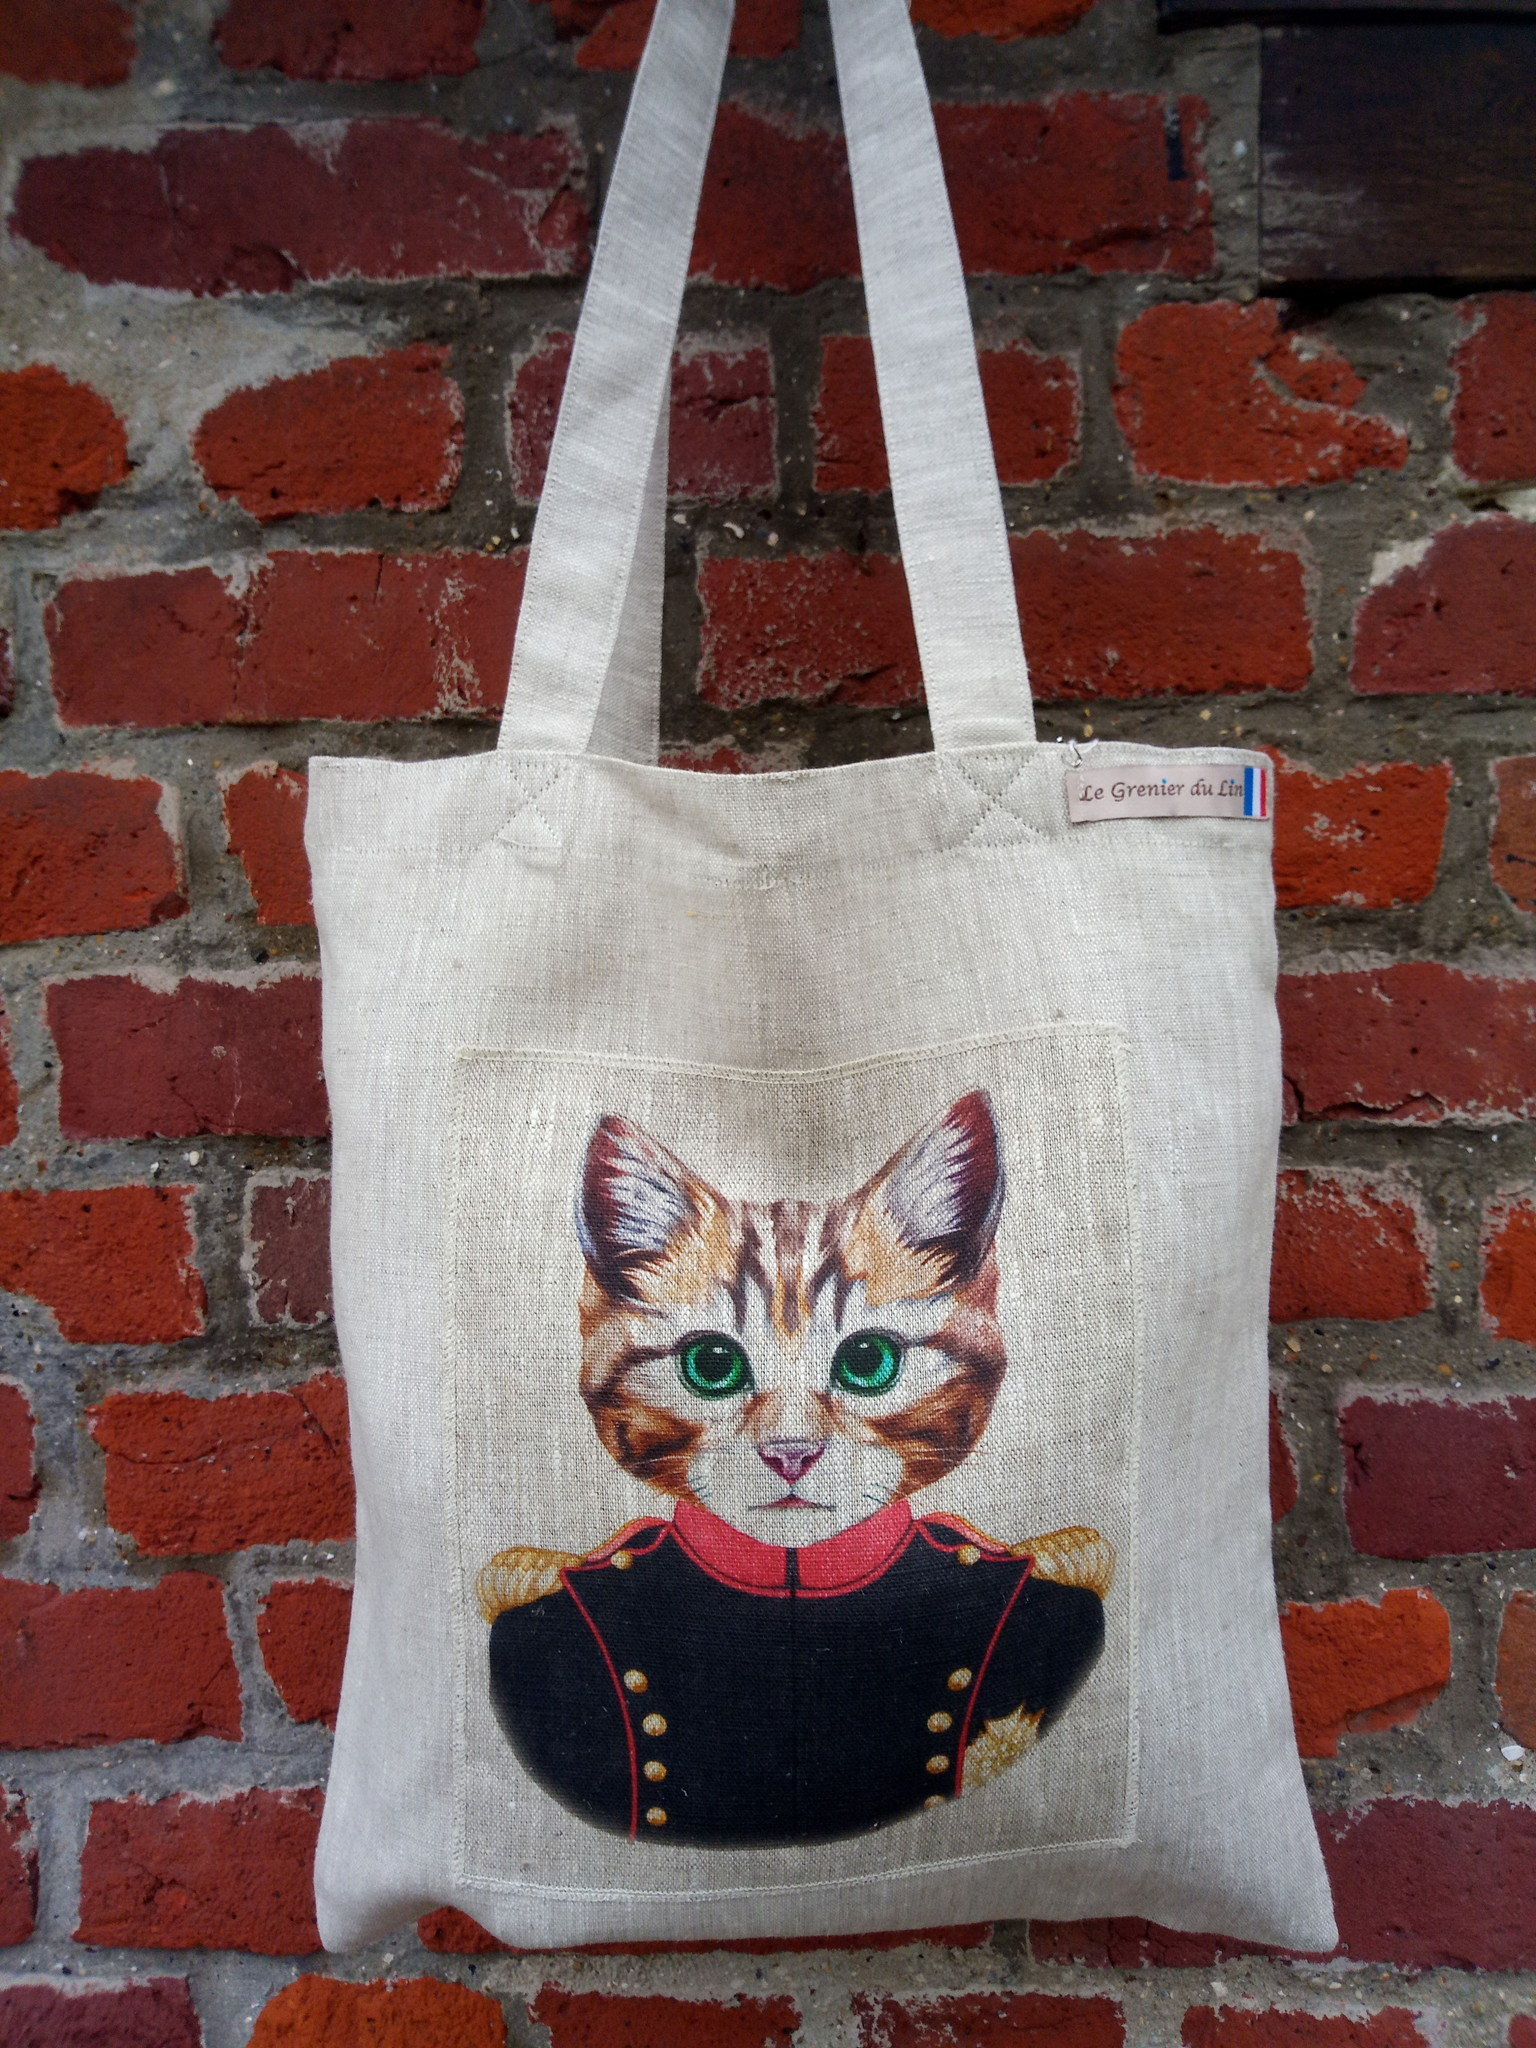 "Le grenier du lin tote bag "" chat de cirque """